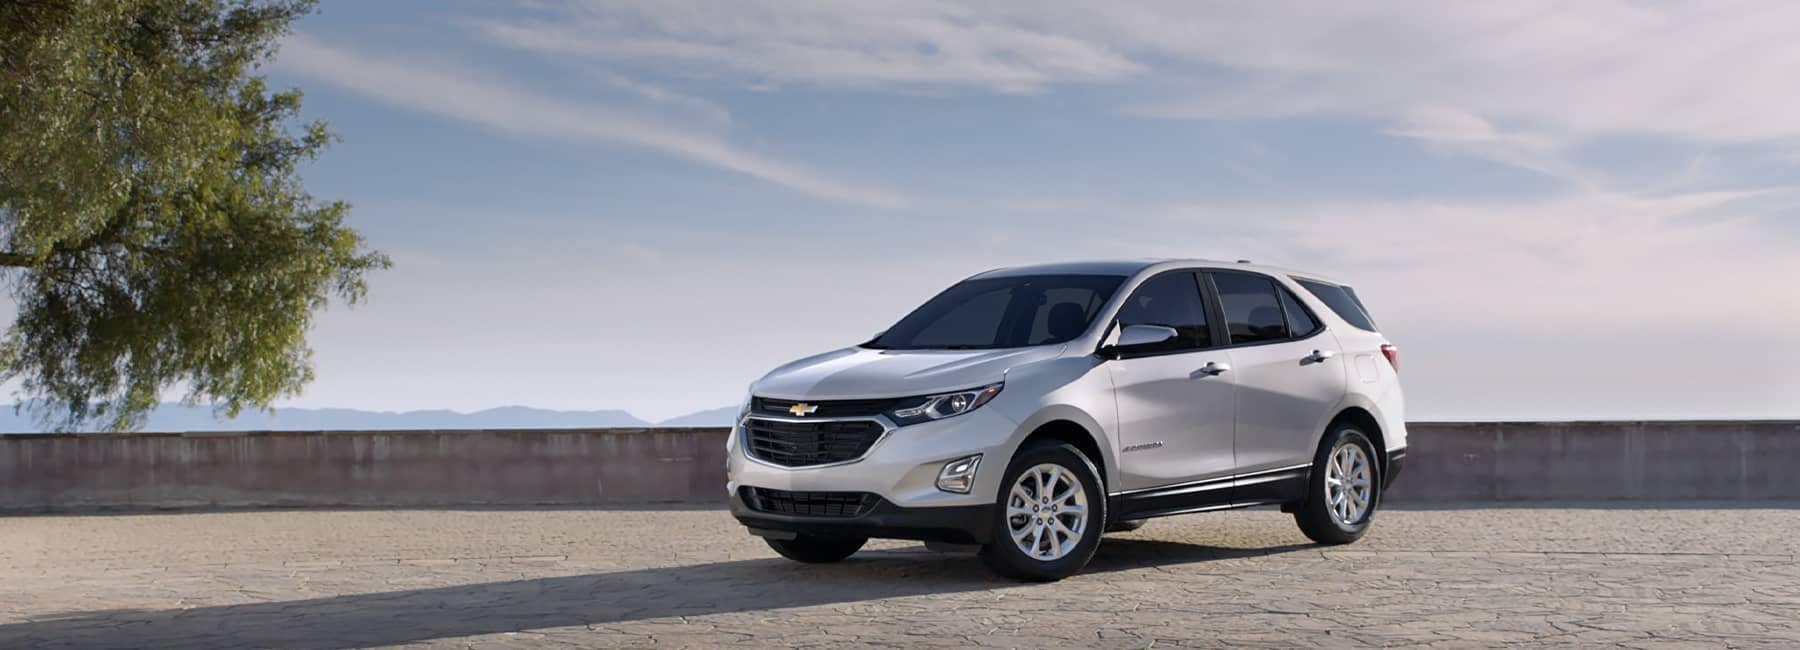 White 2021 Chevrolet Equinox parked